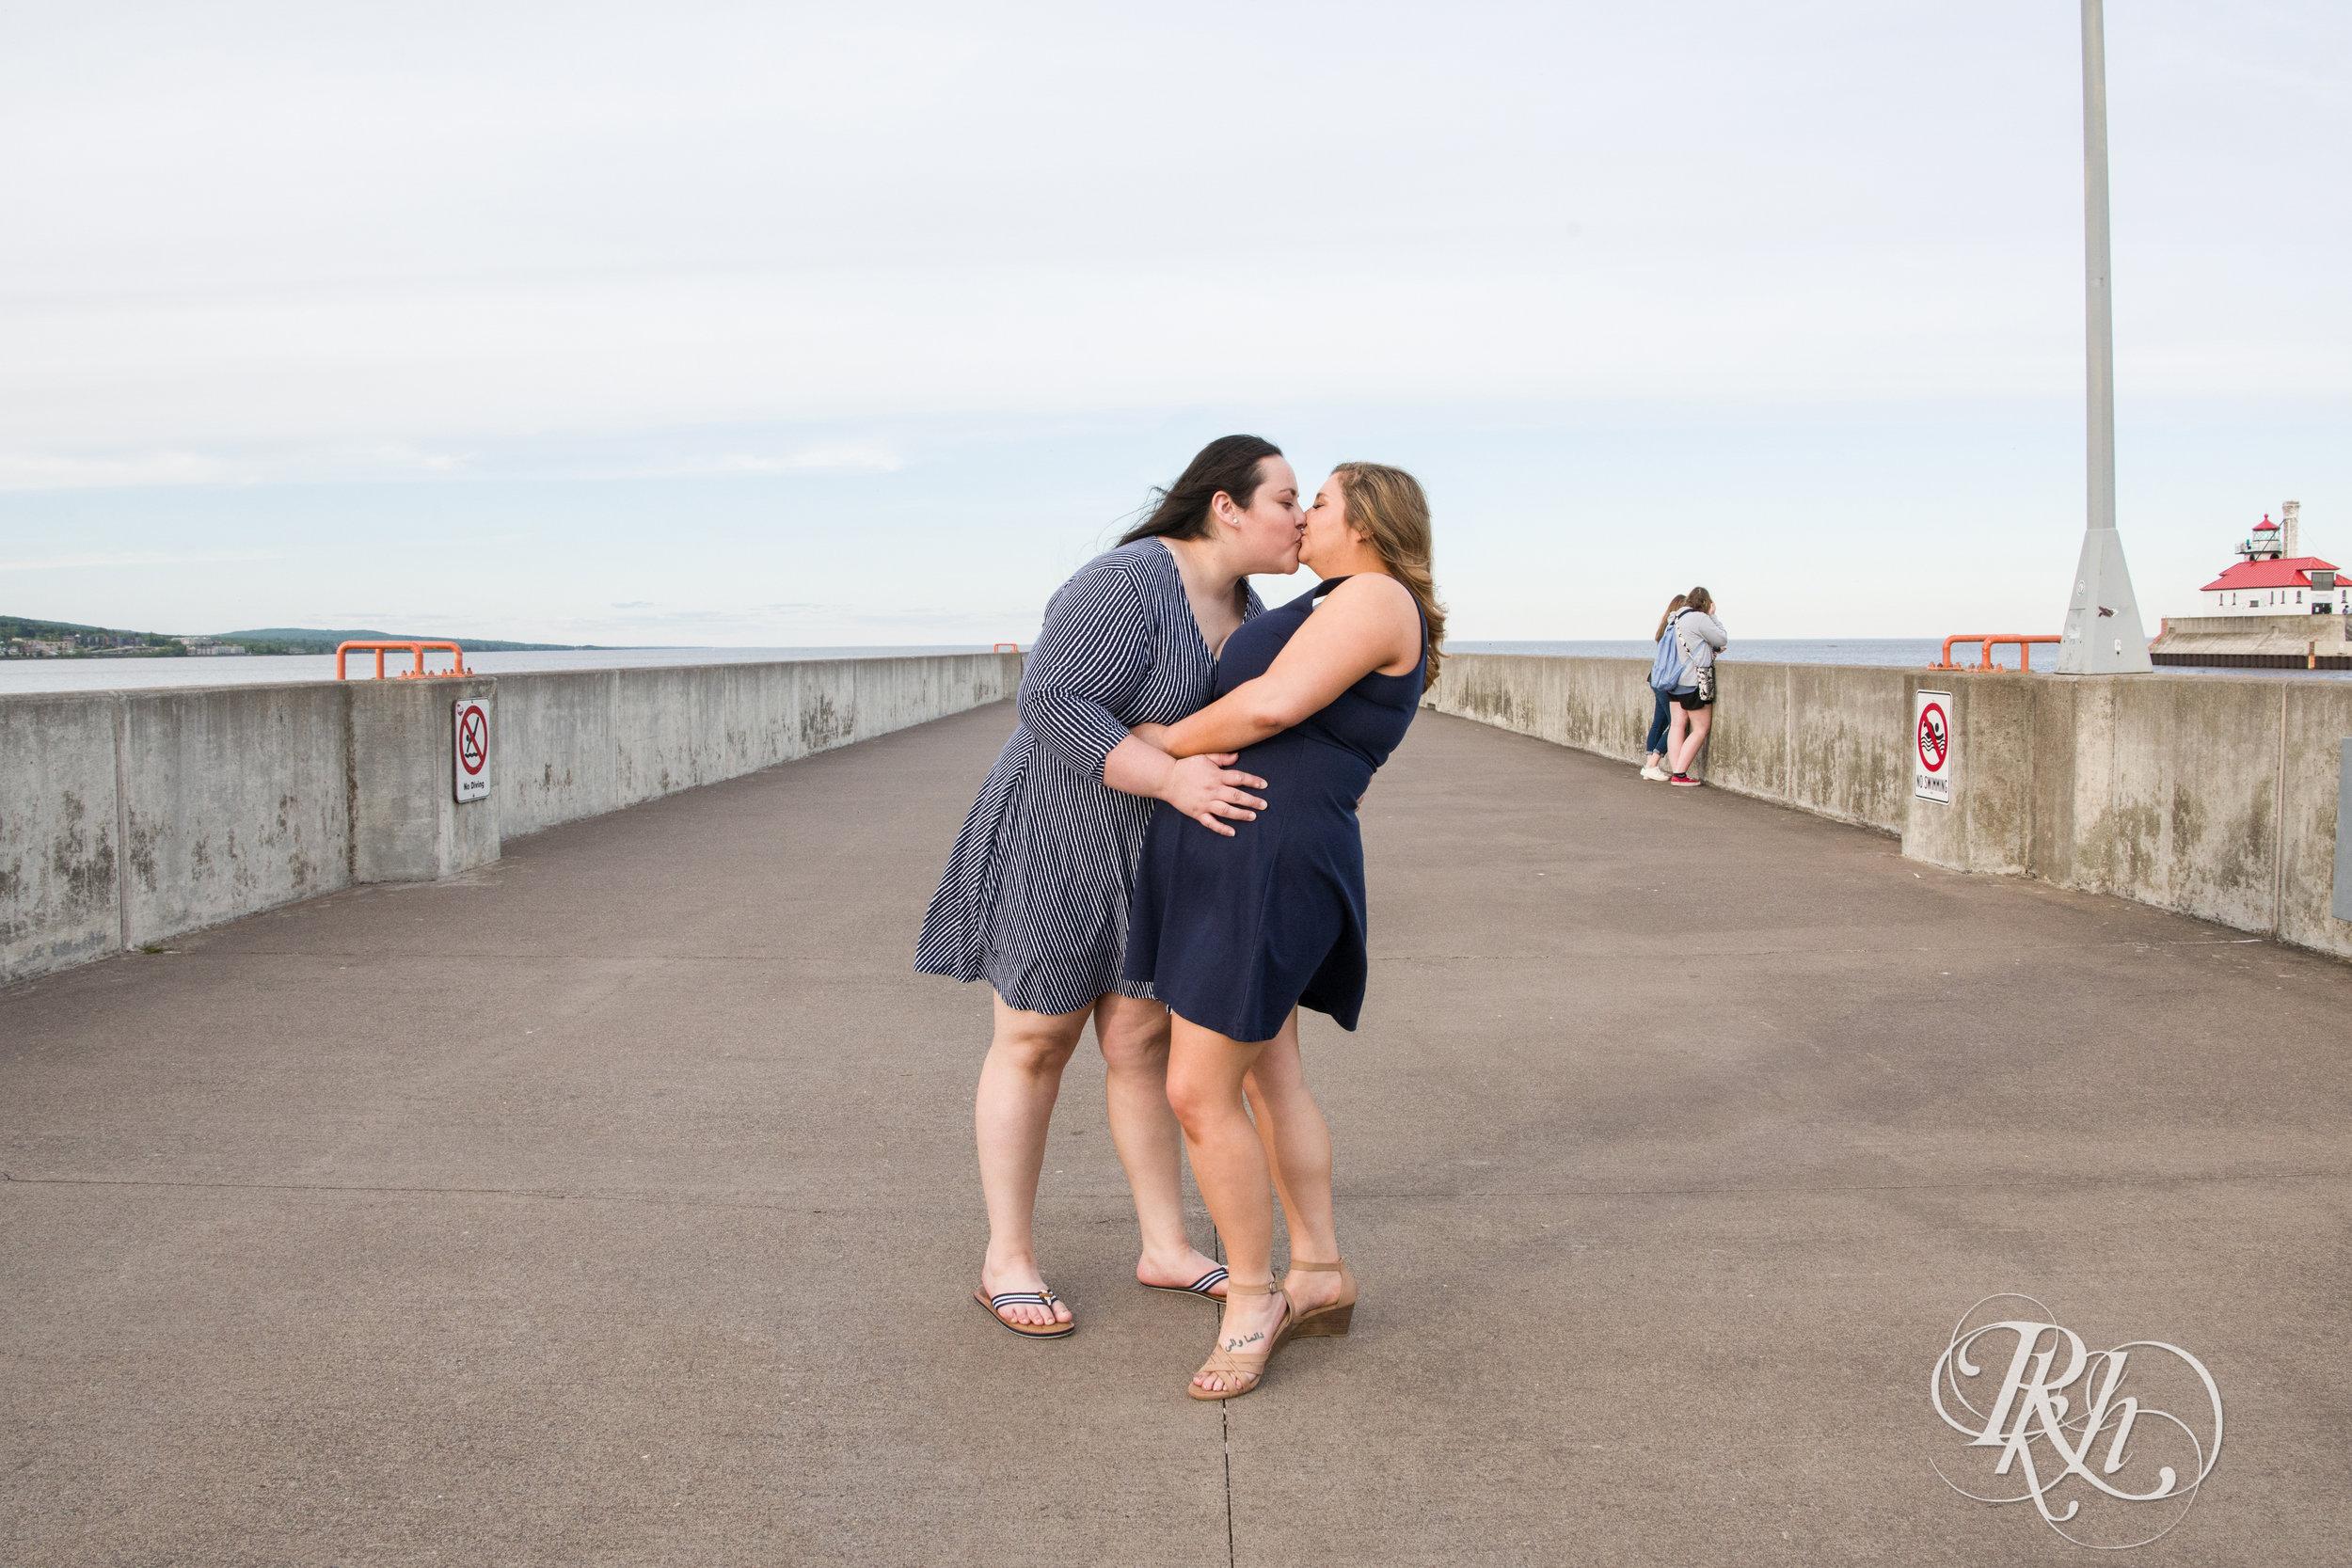 Rose and Yesenia - Minnesota Engagement Photography - Duluth - RKH Images - Blog (17 of 22).jpg